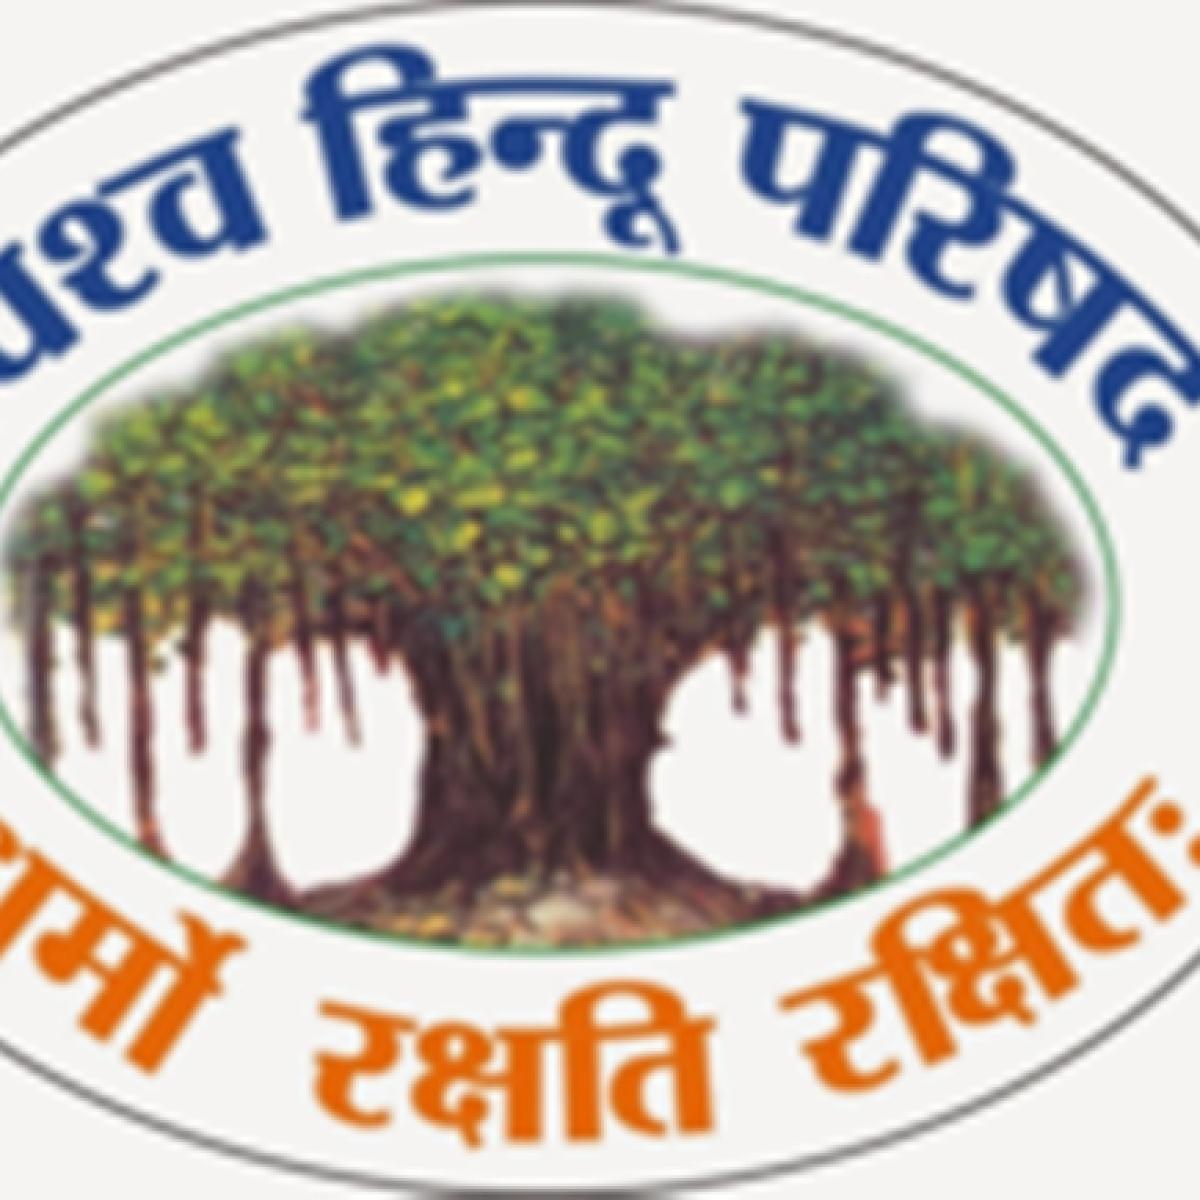 A decisive step towards construction of temple: VHP